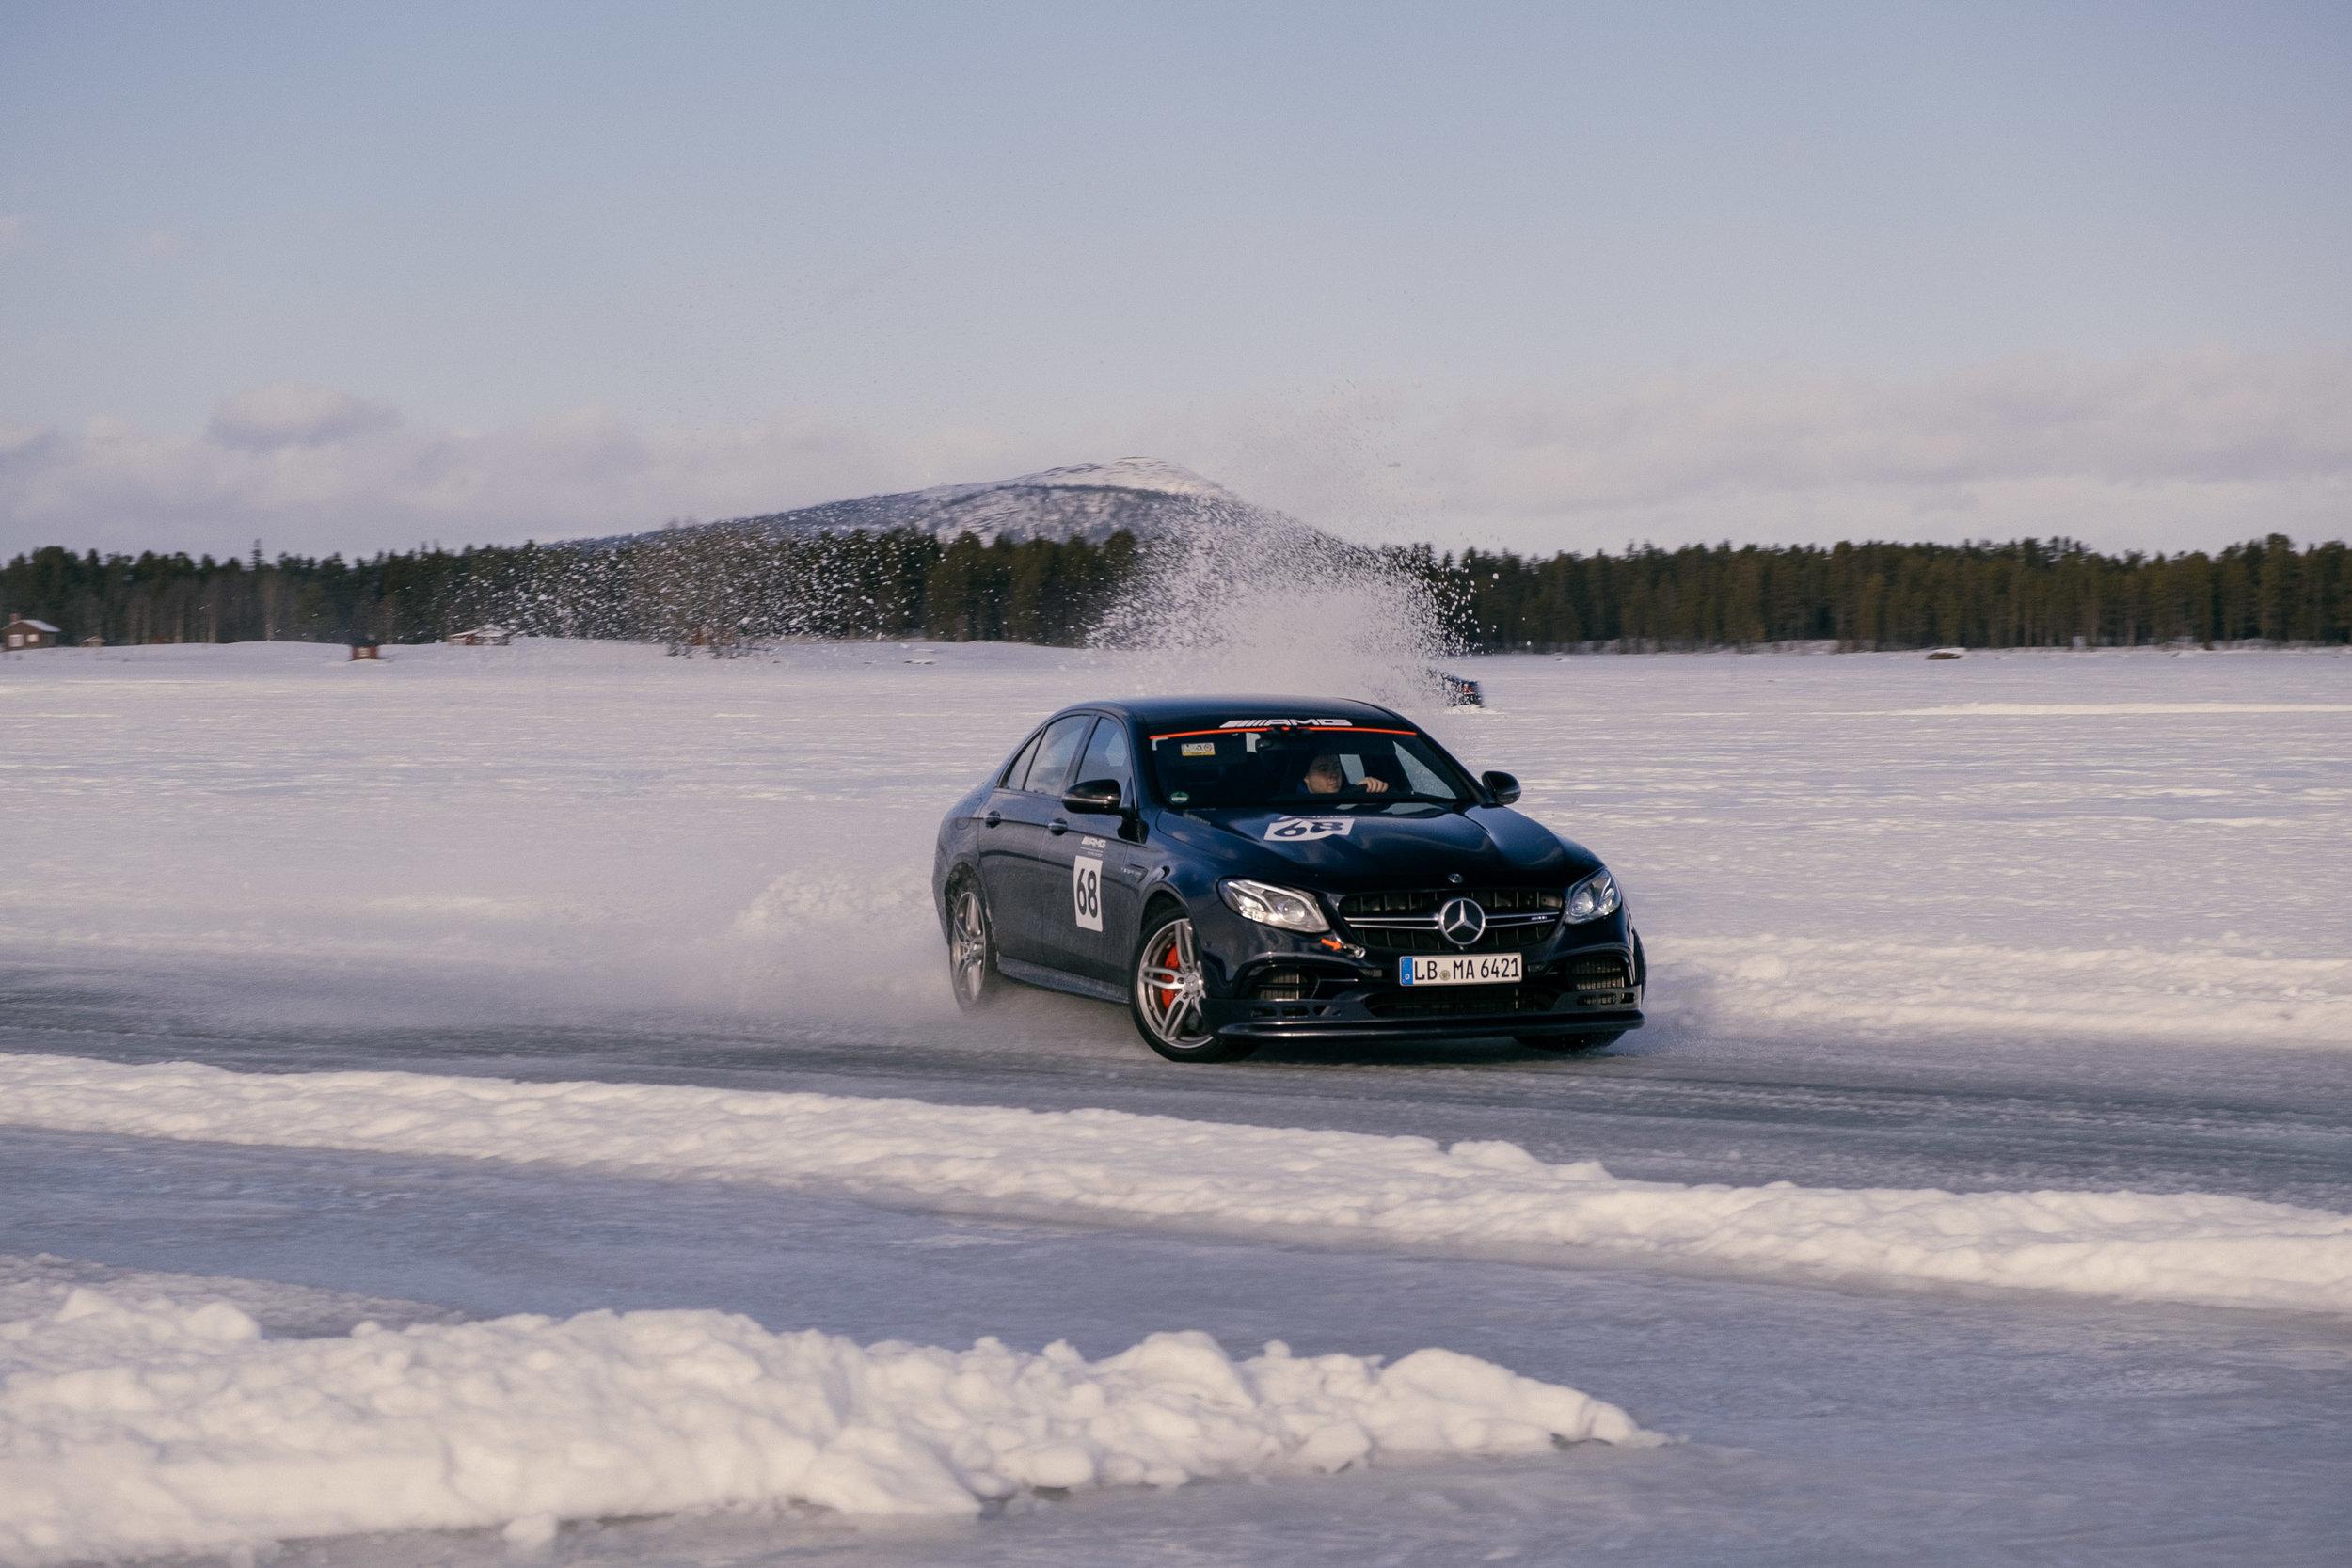 Drive_for_Good_Ice_Drive_by_Maxim_Kuijper-0582.jpg